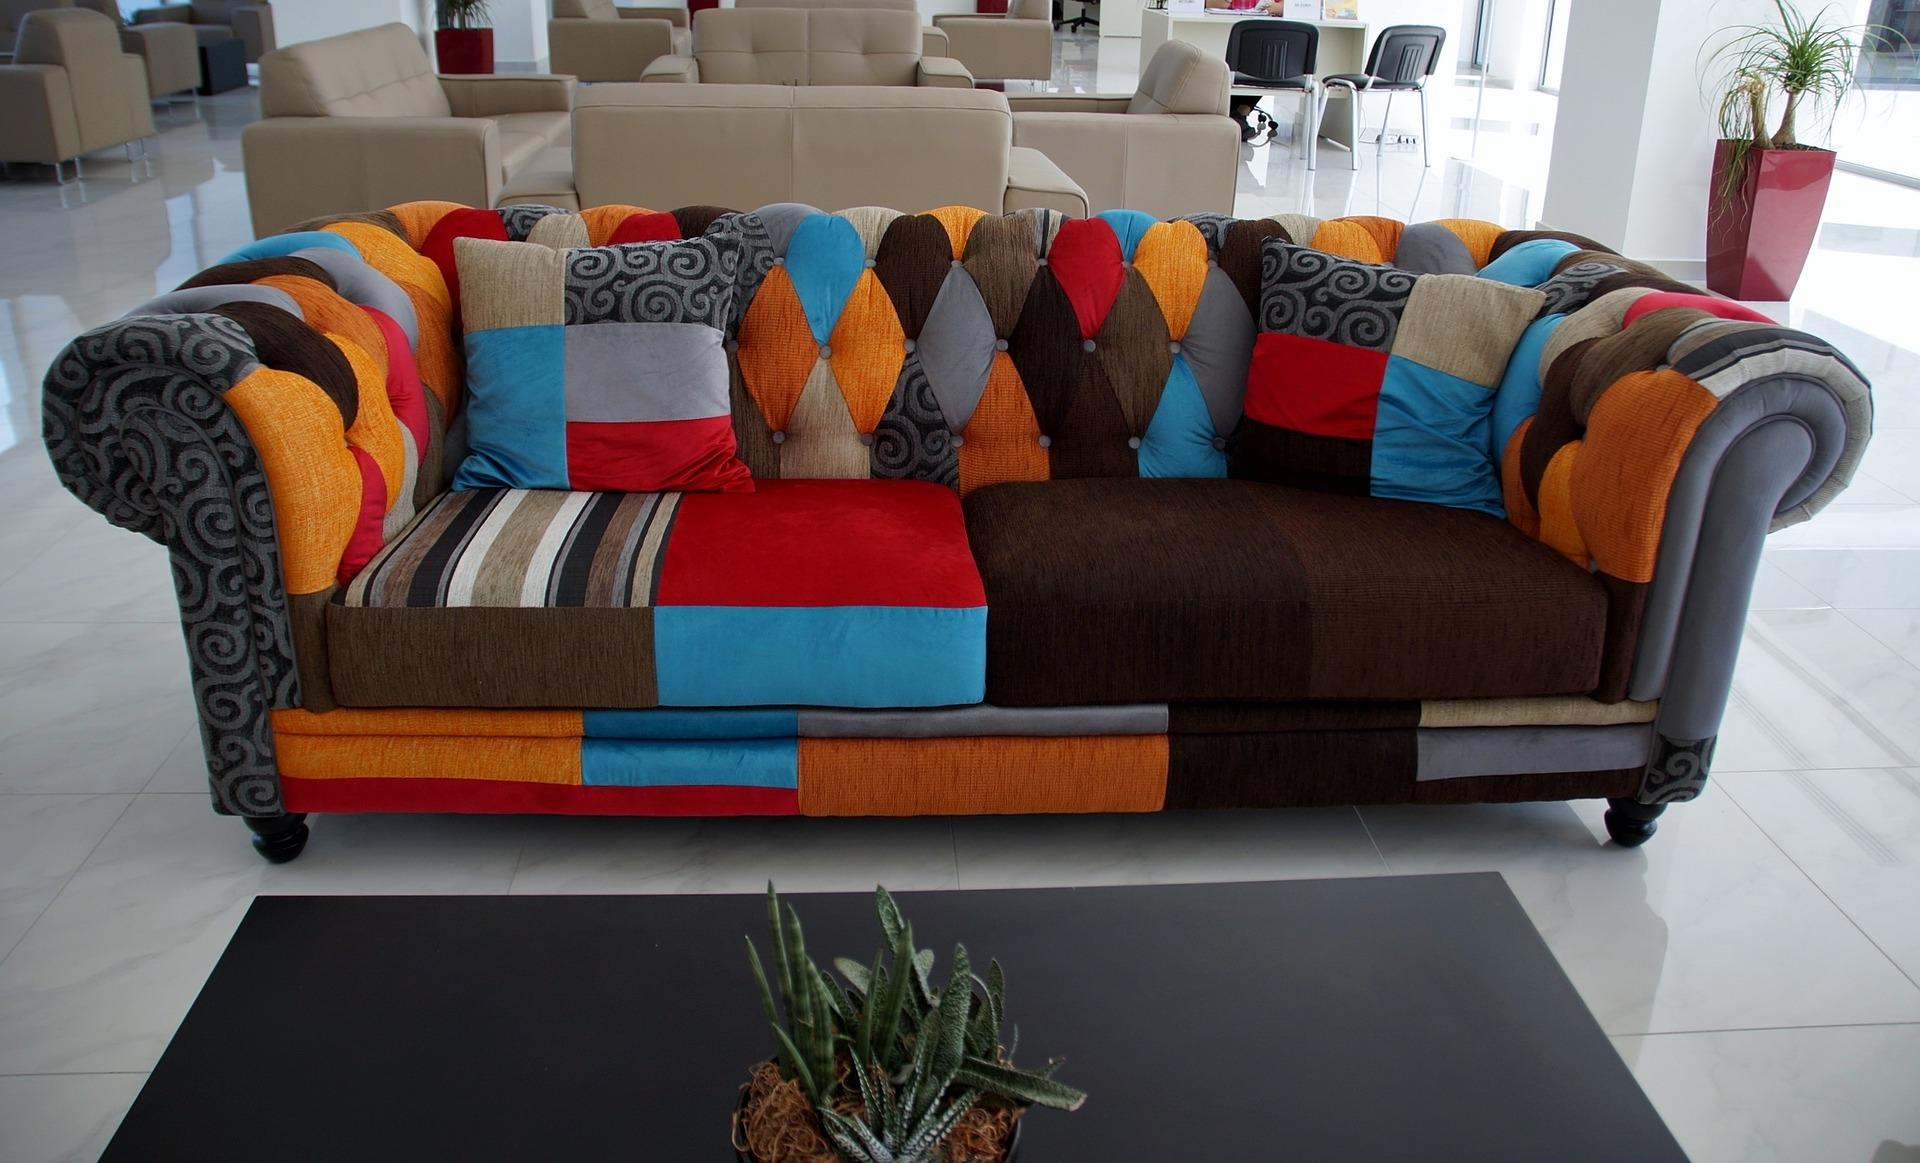 Обивка старых диванов своими руками фото 15